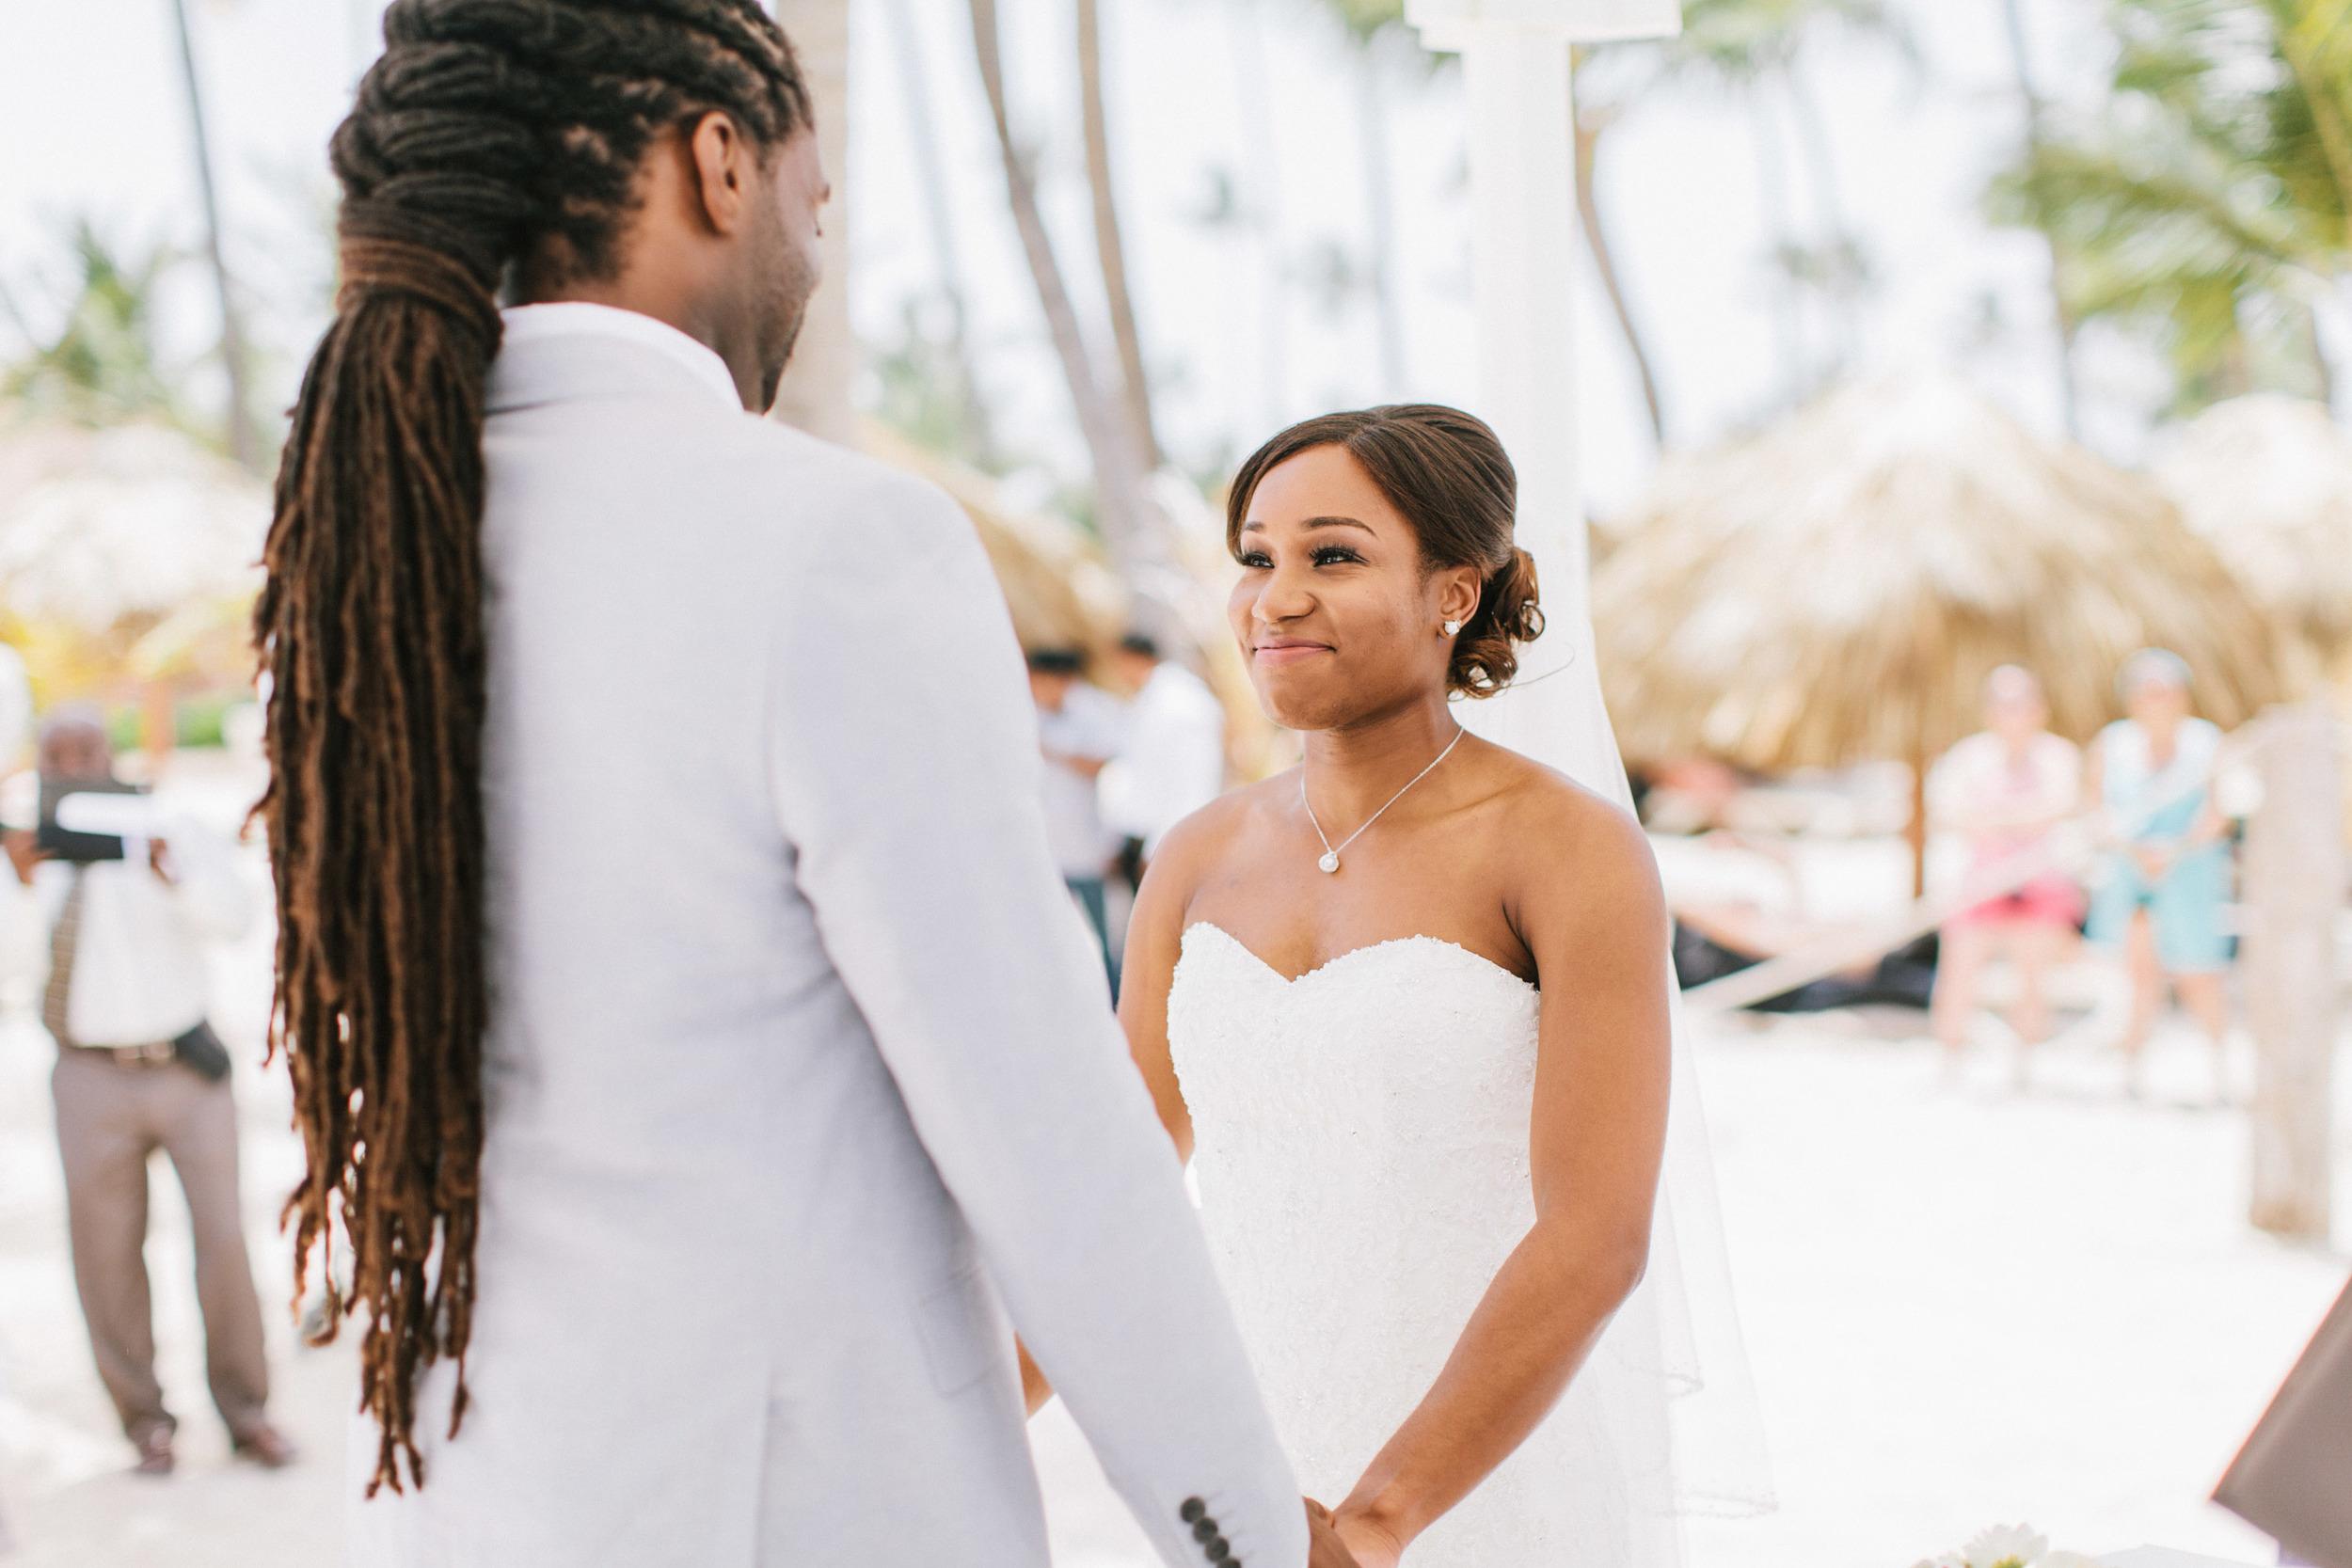 michael-rousseau-photography-dominican-republic-destination-wedding-cara-jason-colonial-majestic-dominican-republic073.jpg